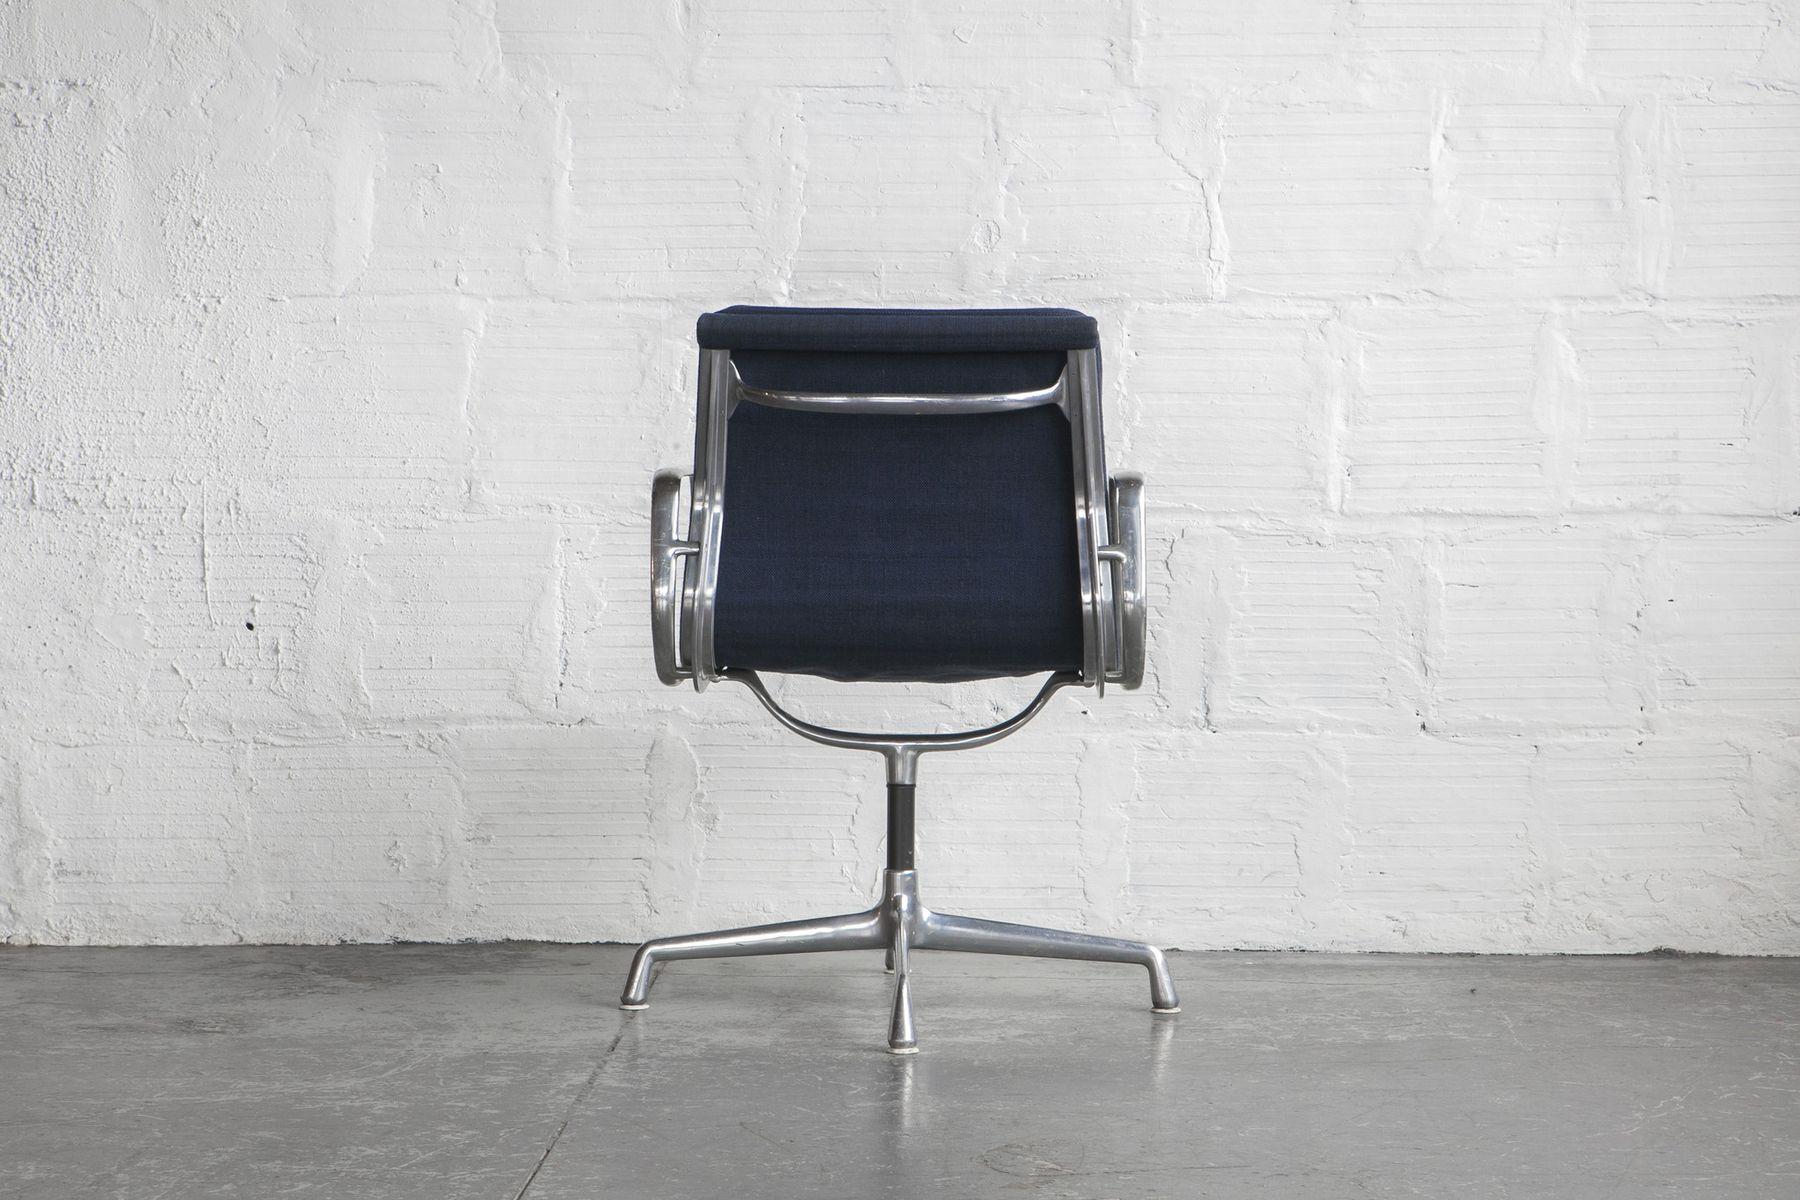 Bürostuhl designklassiker eames  Gepolsterter Bürostuhl von Charles & Ray Eames für Vitra, 1960er ...